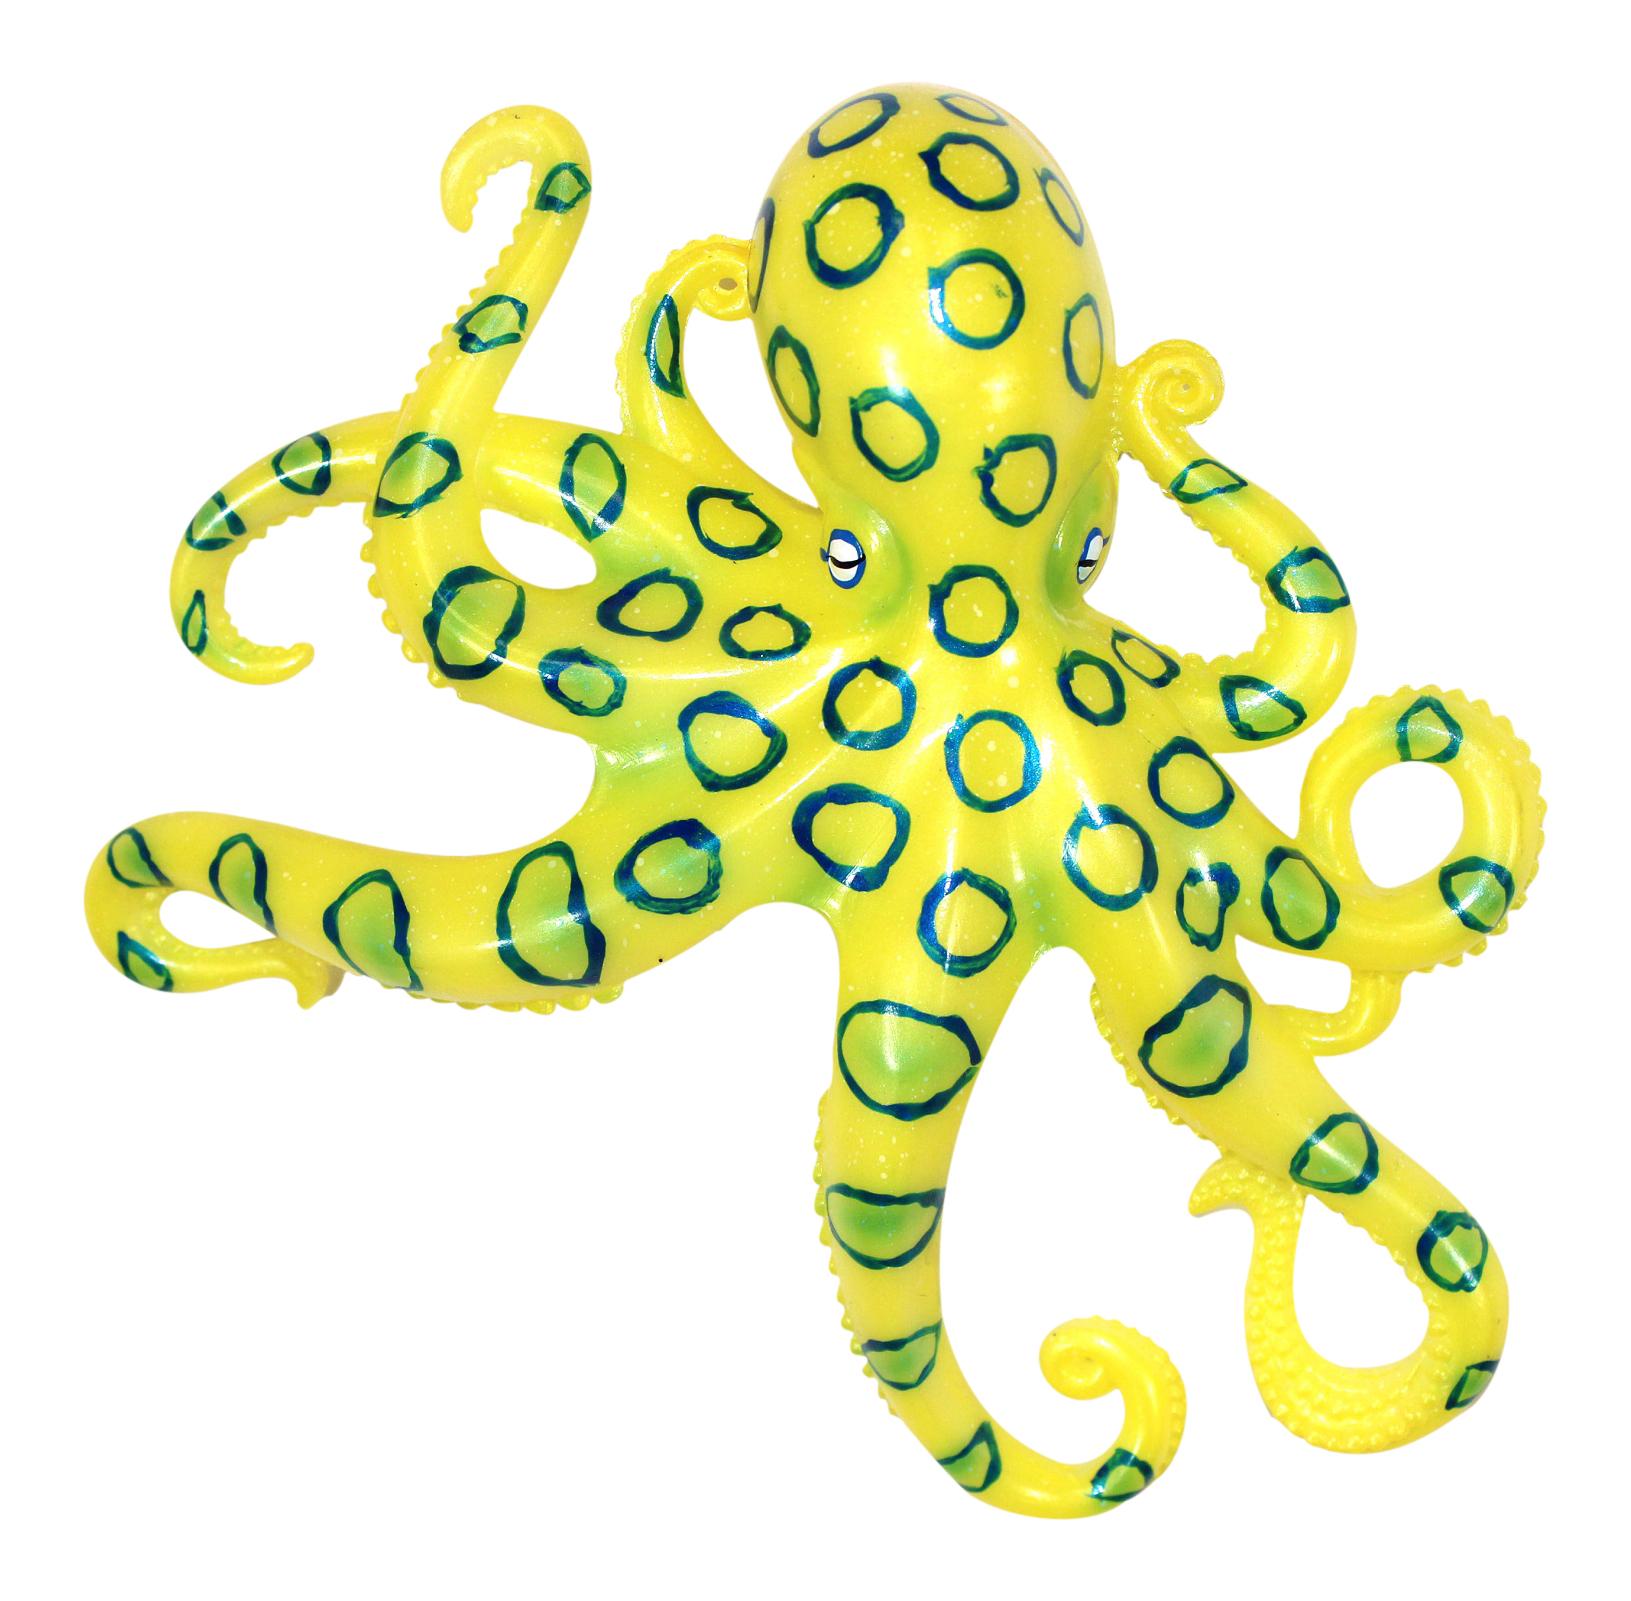 Coastal Sea Creature Yellow Octopus 9 Inch Wall Decor Resin Plaque ...